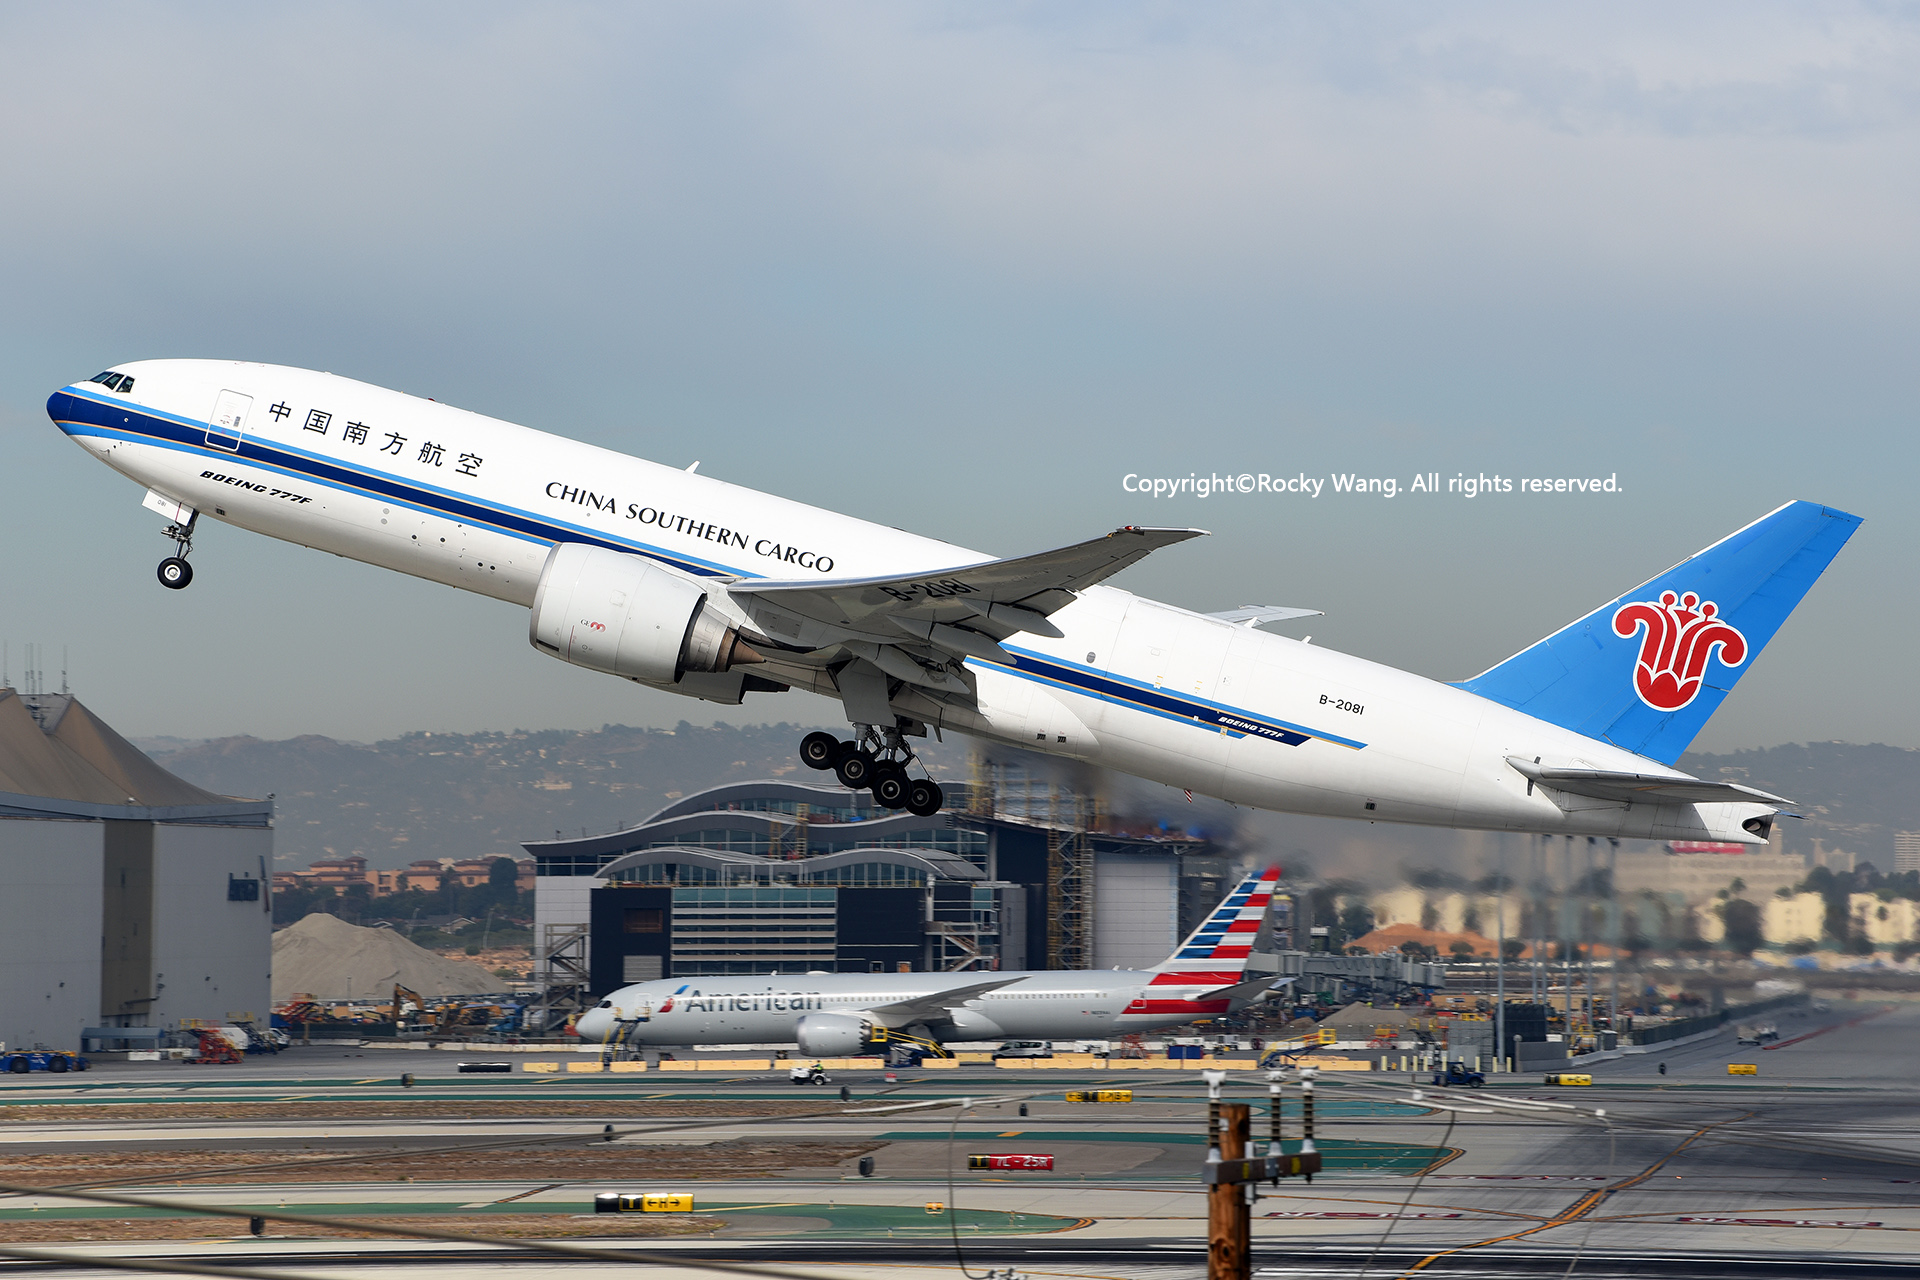 Re:[原创]居家了 批量处理老图 倾情奉献52家777 BOEING 777-F1B B-2081 Los Angeles Int'l Airport